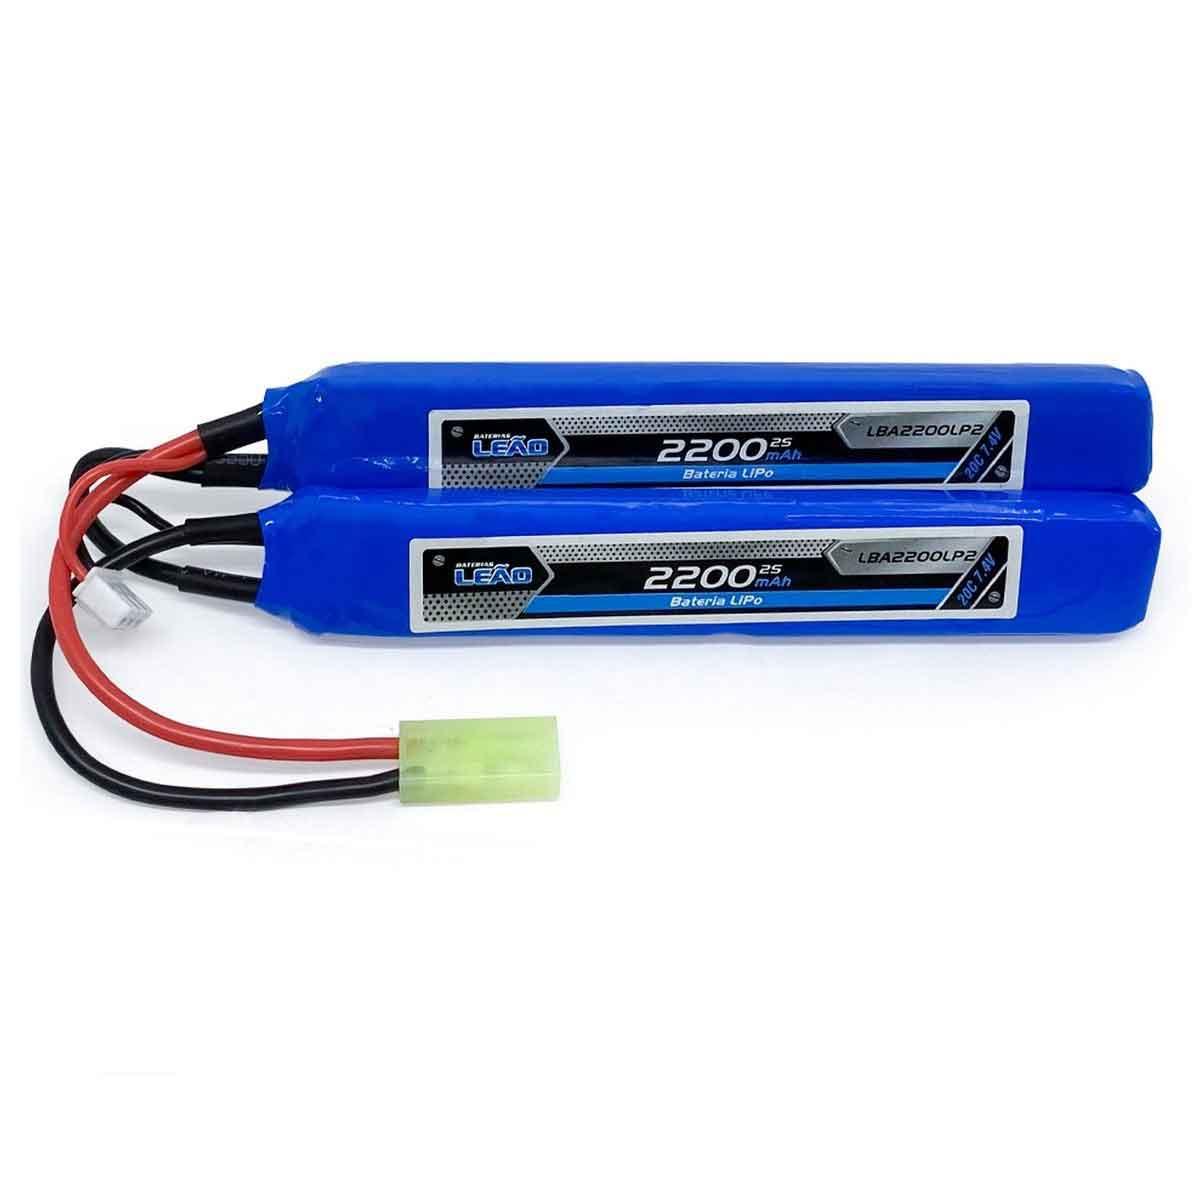 Bateria Lipo 7.4V/2S 2200mAh - 20C 2 pack